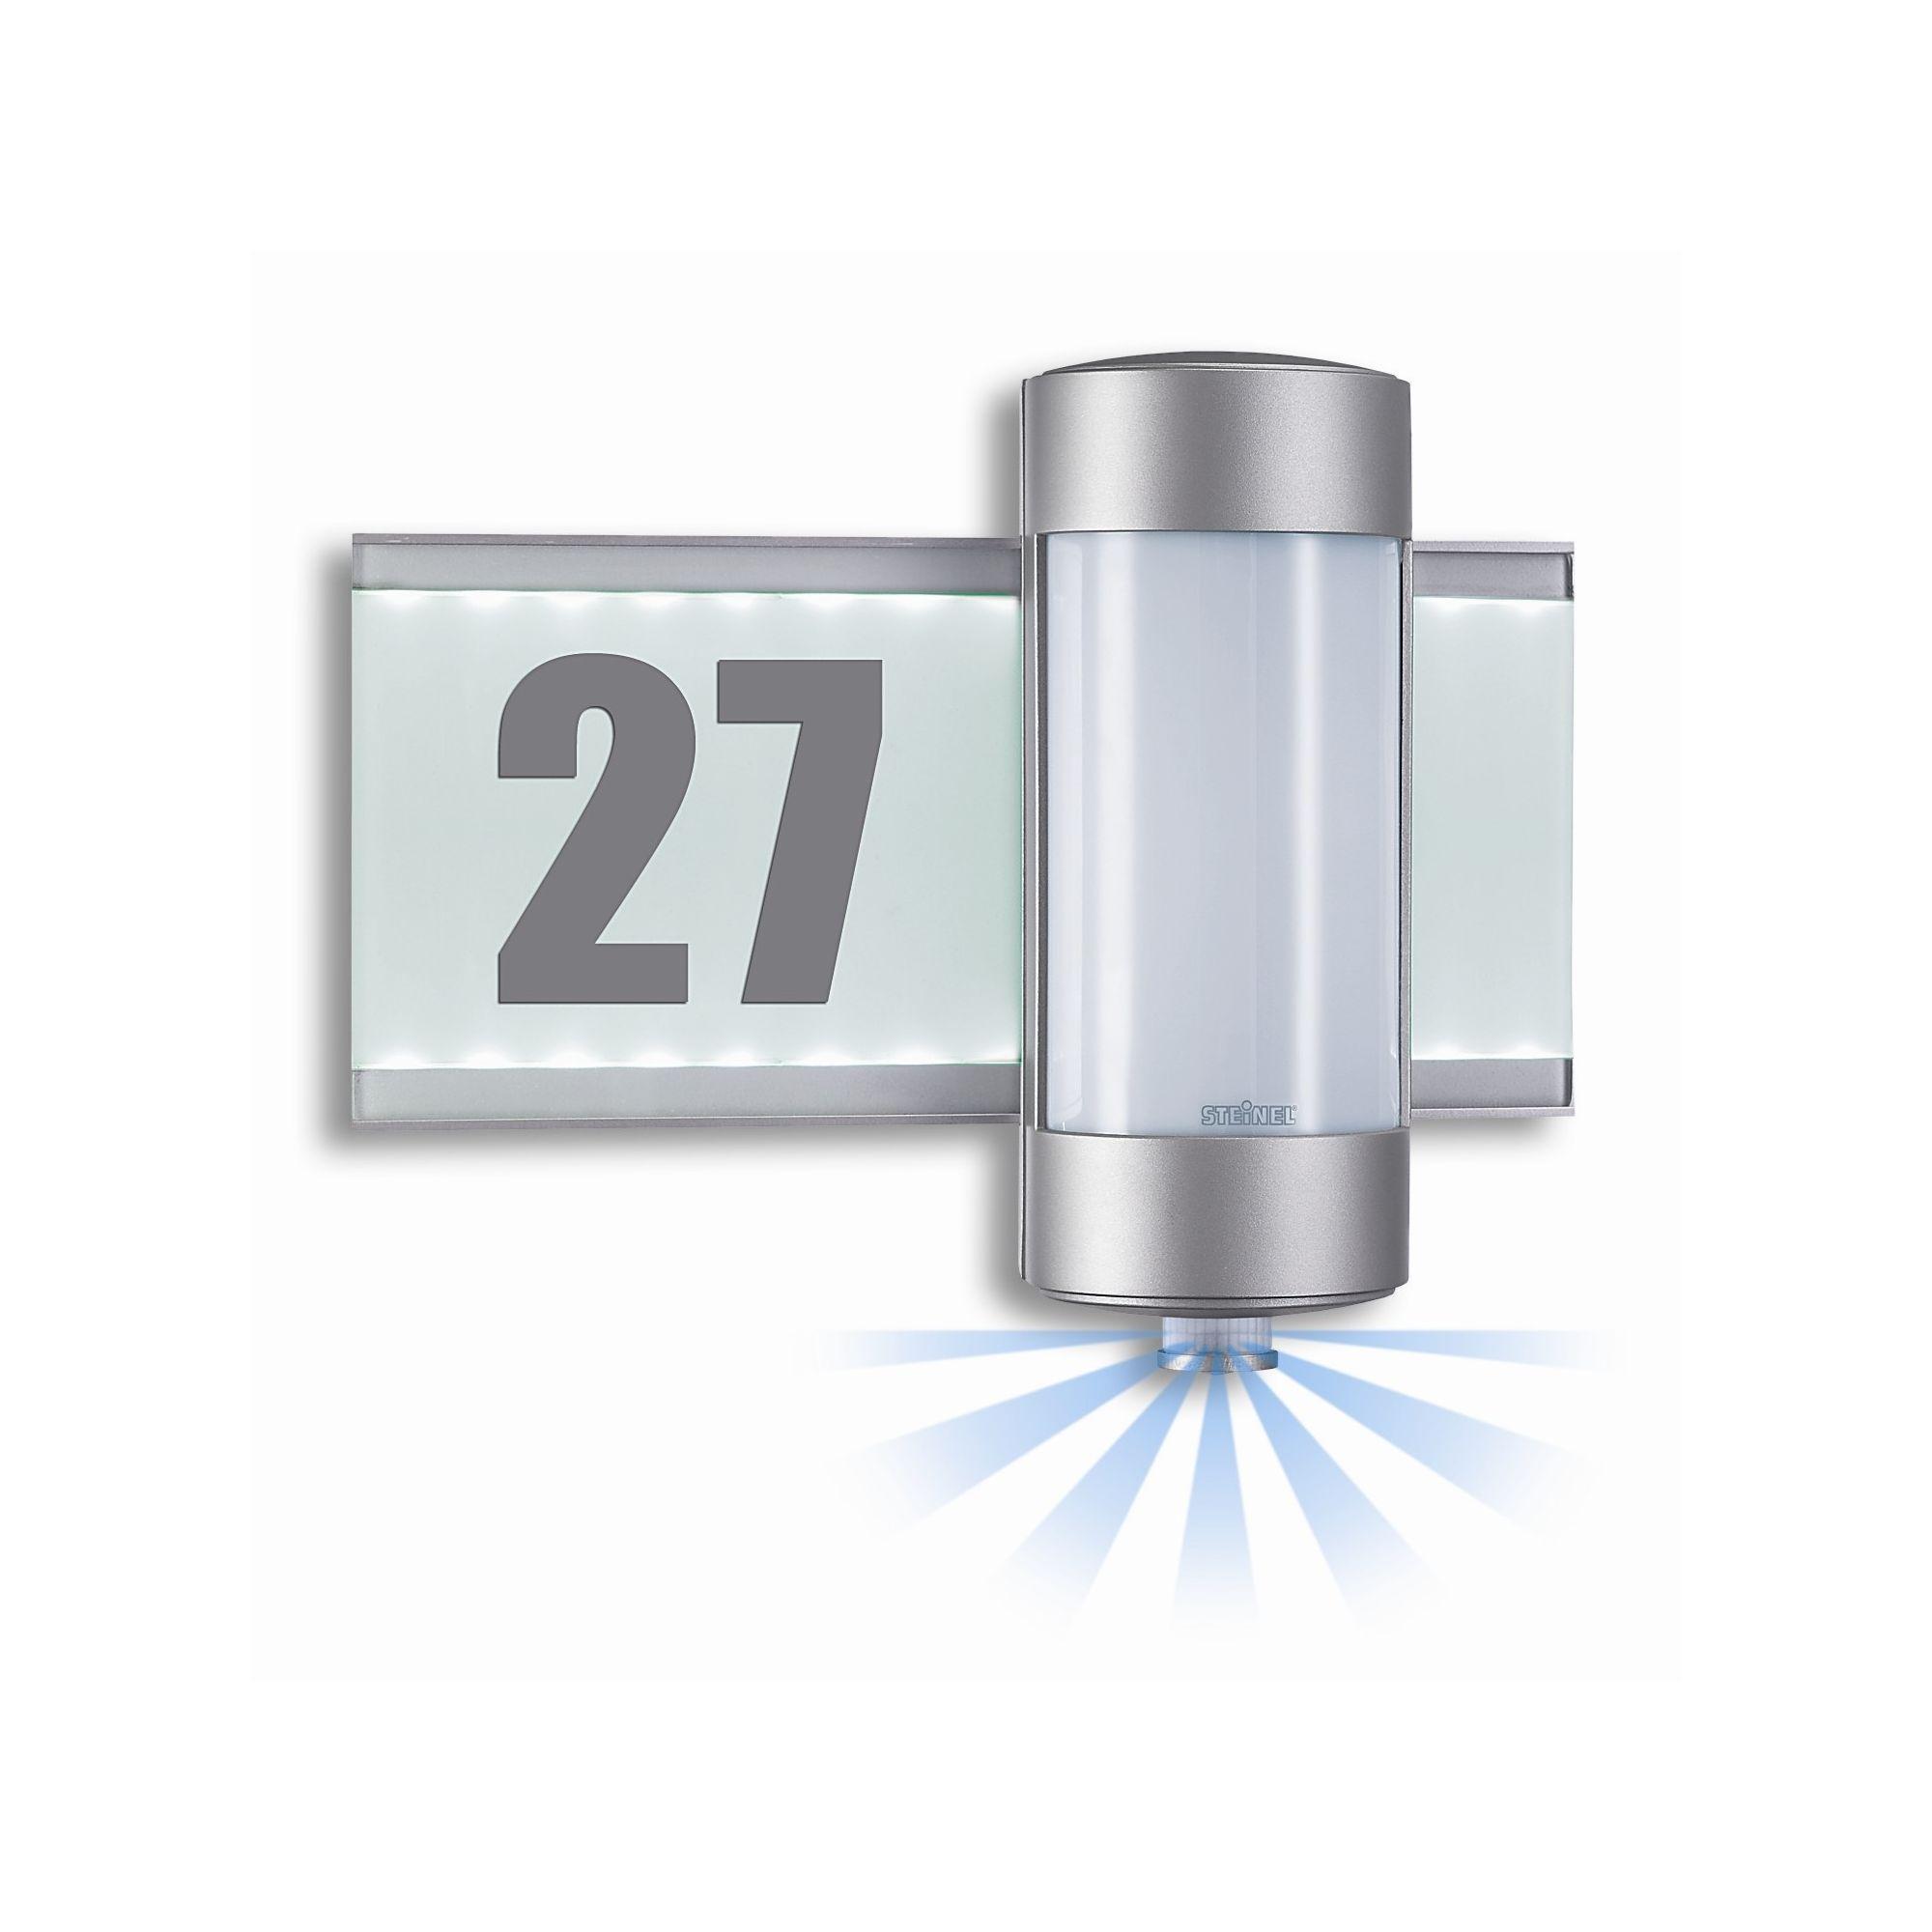 Home and garden > Lighting: Steinel BRS 81 Bathroom Sensor Light - Special Offers